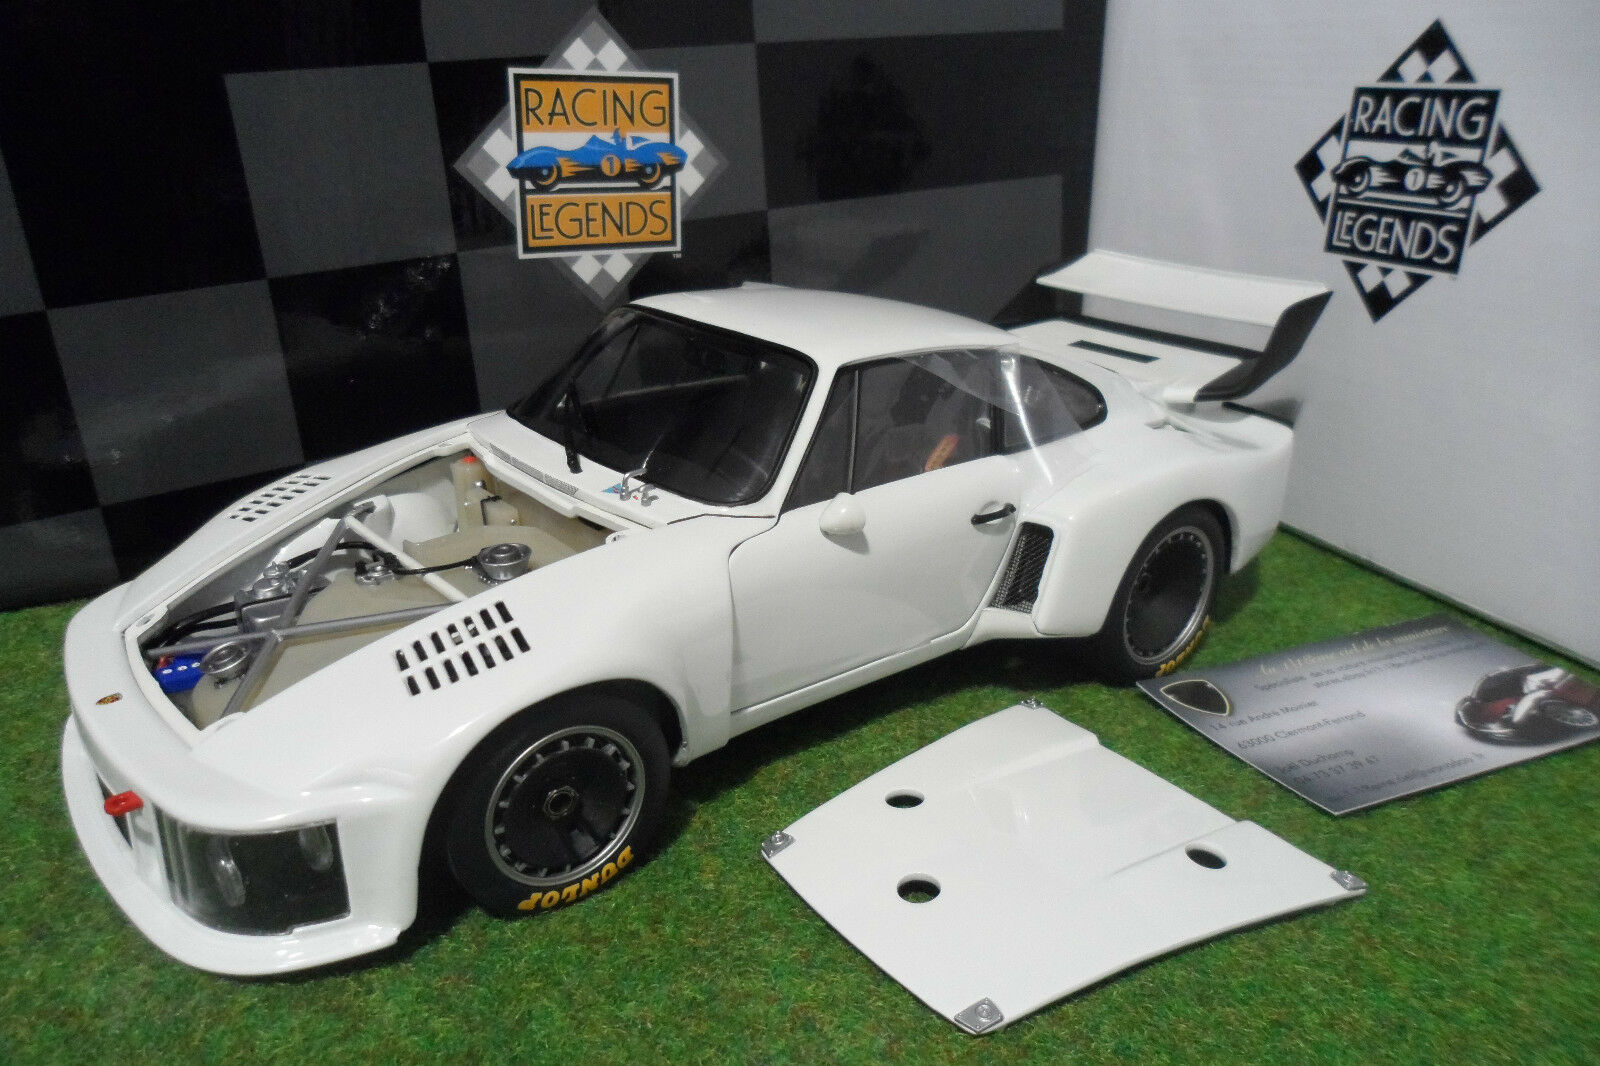 PORSCHE 935 Turbo Street bianco Works Prossootype 1976 au 1 18 EXOTO RLG18100